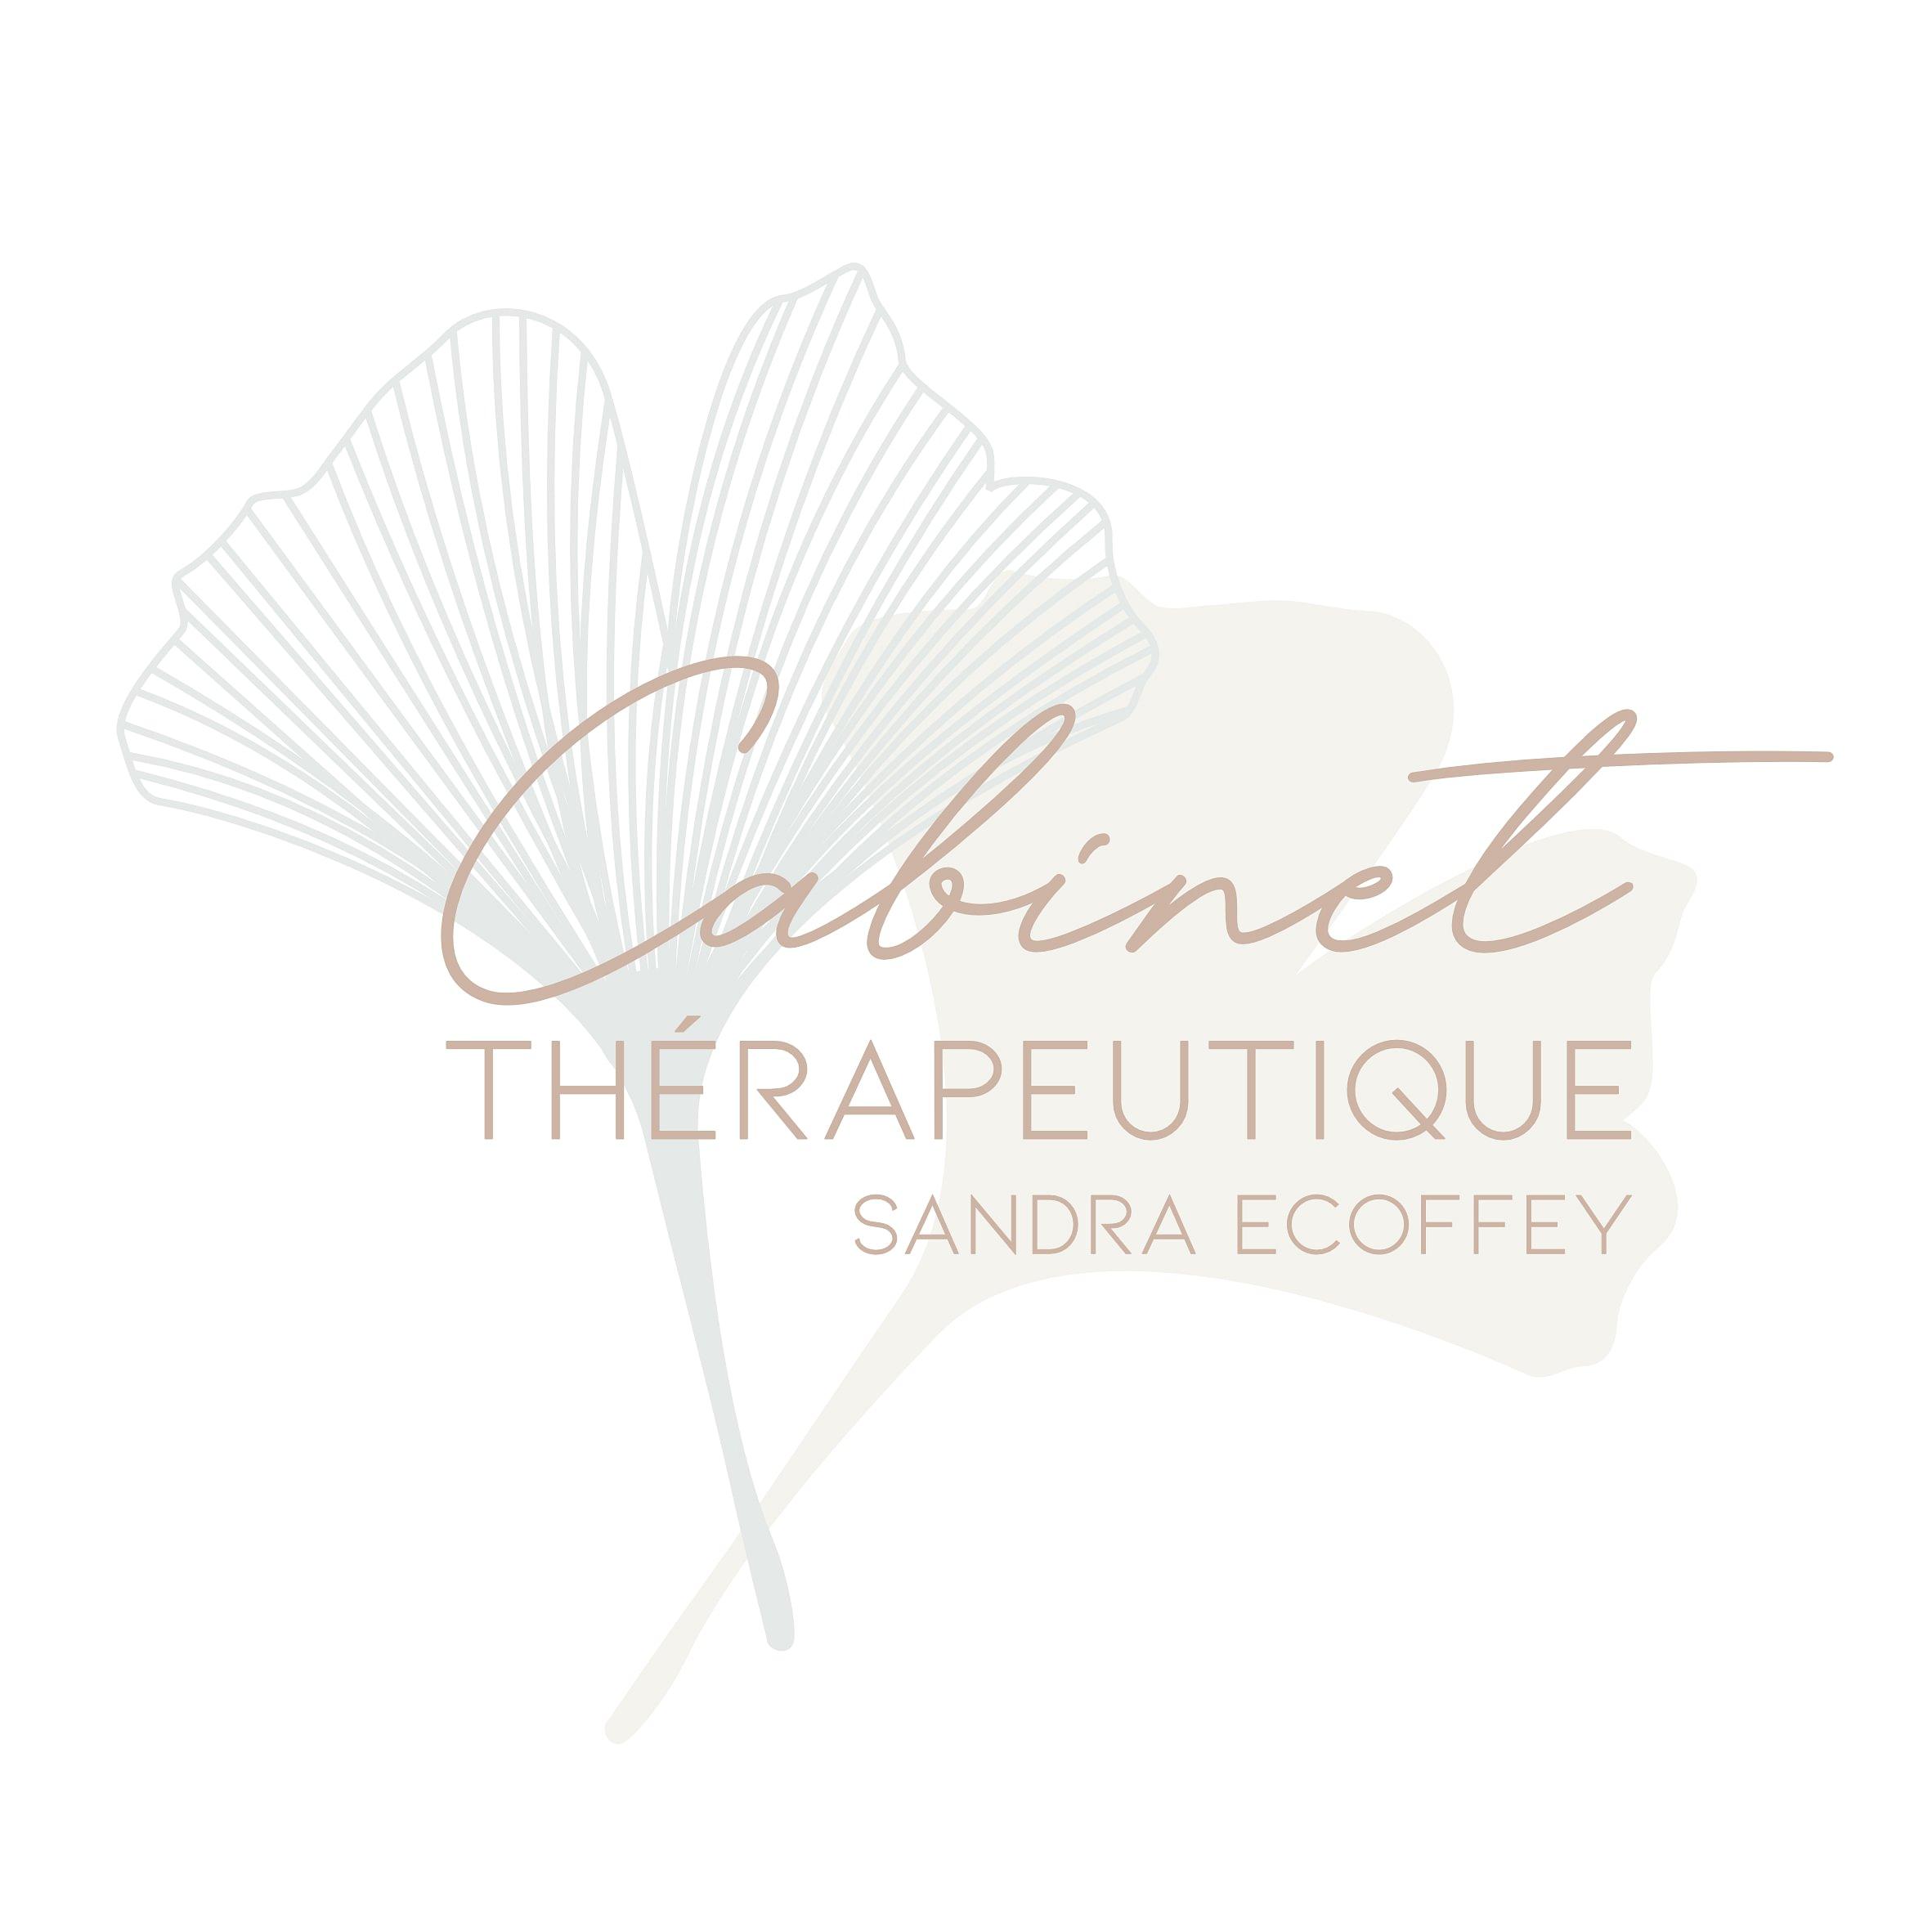 Sandra Ecoffey,